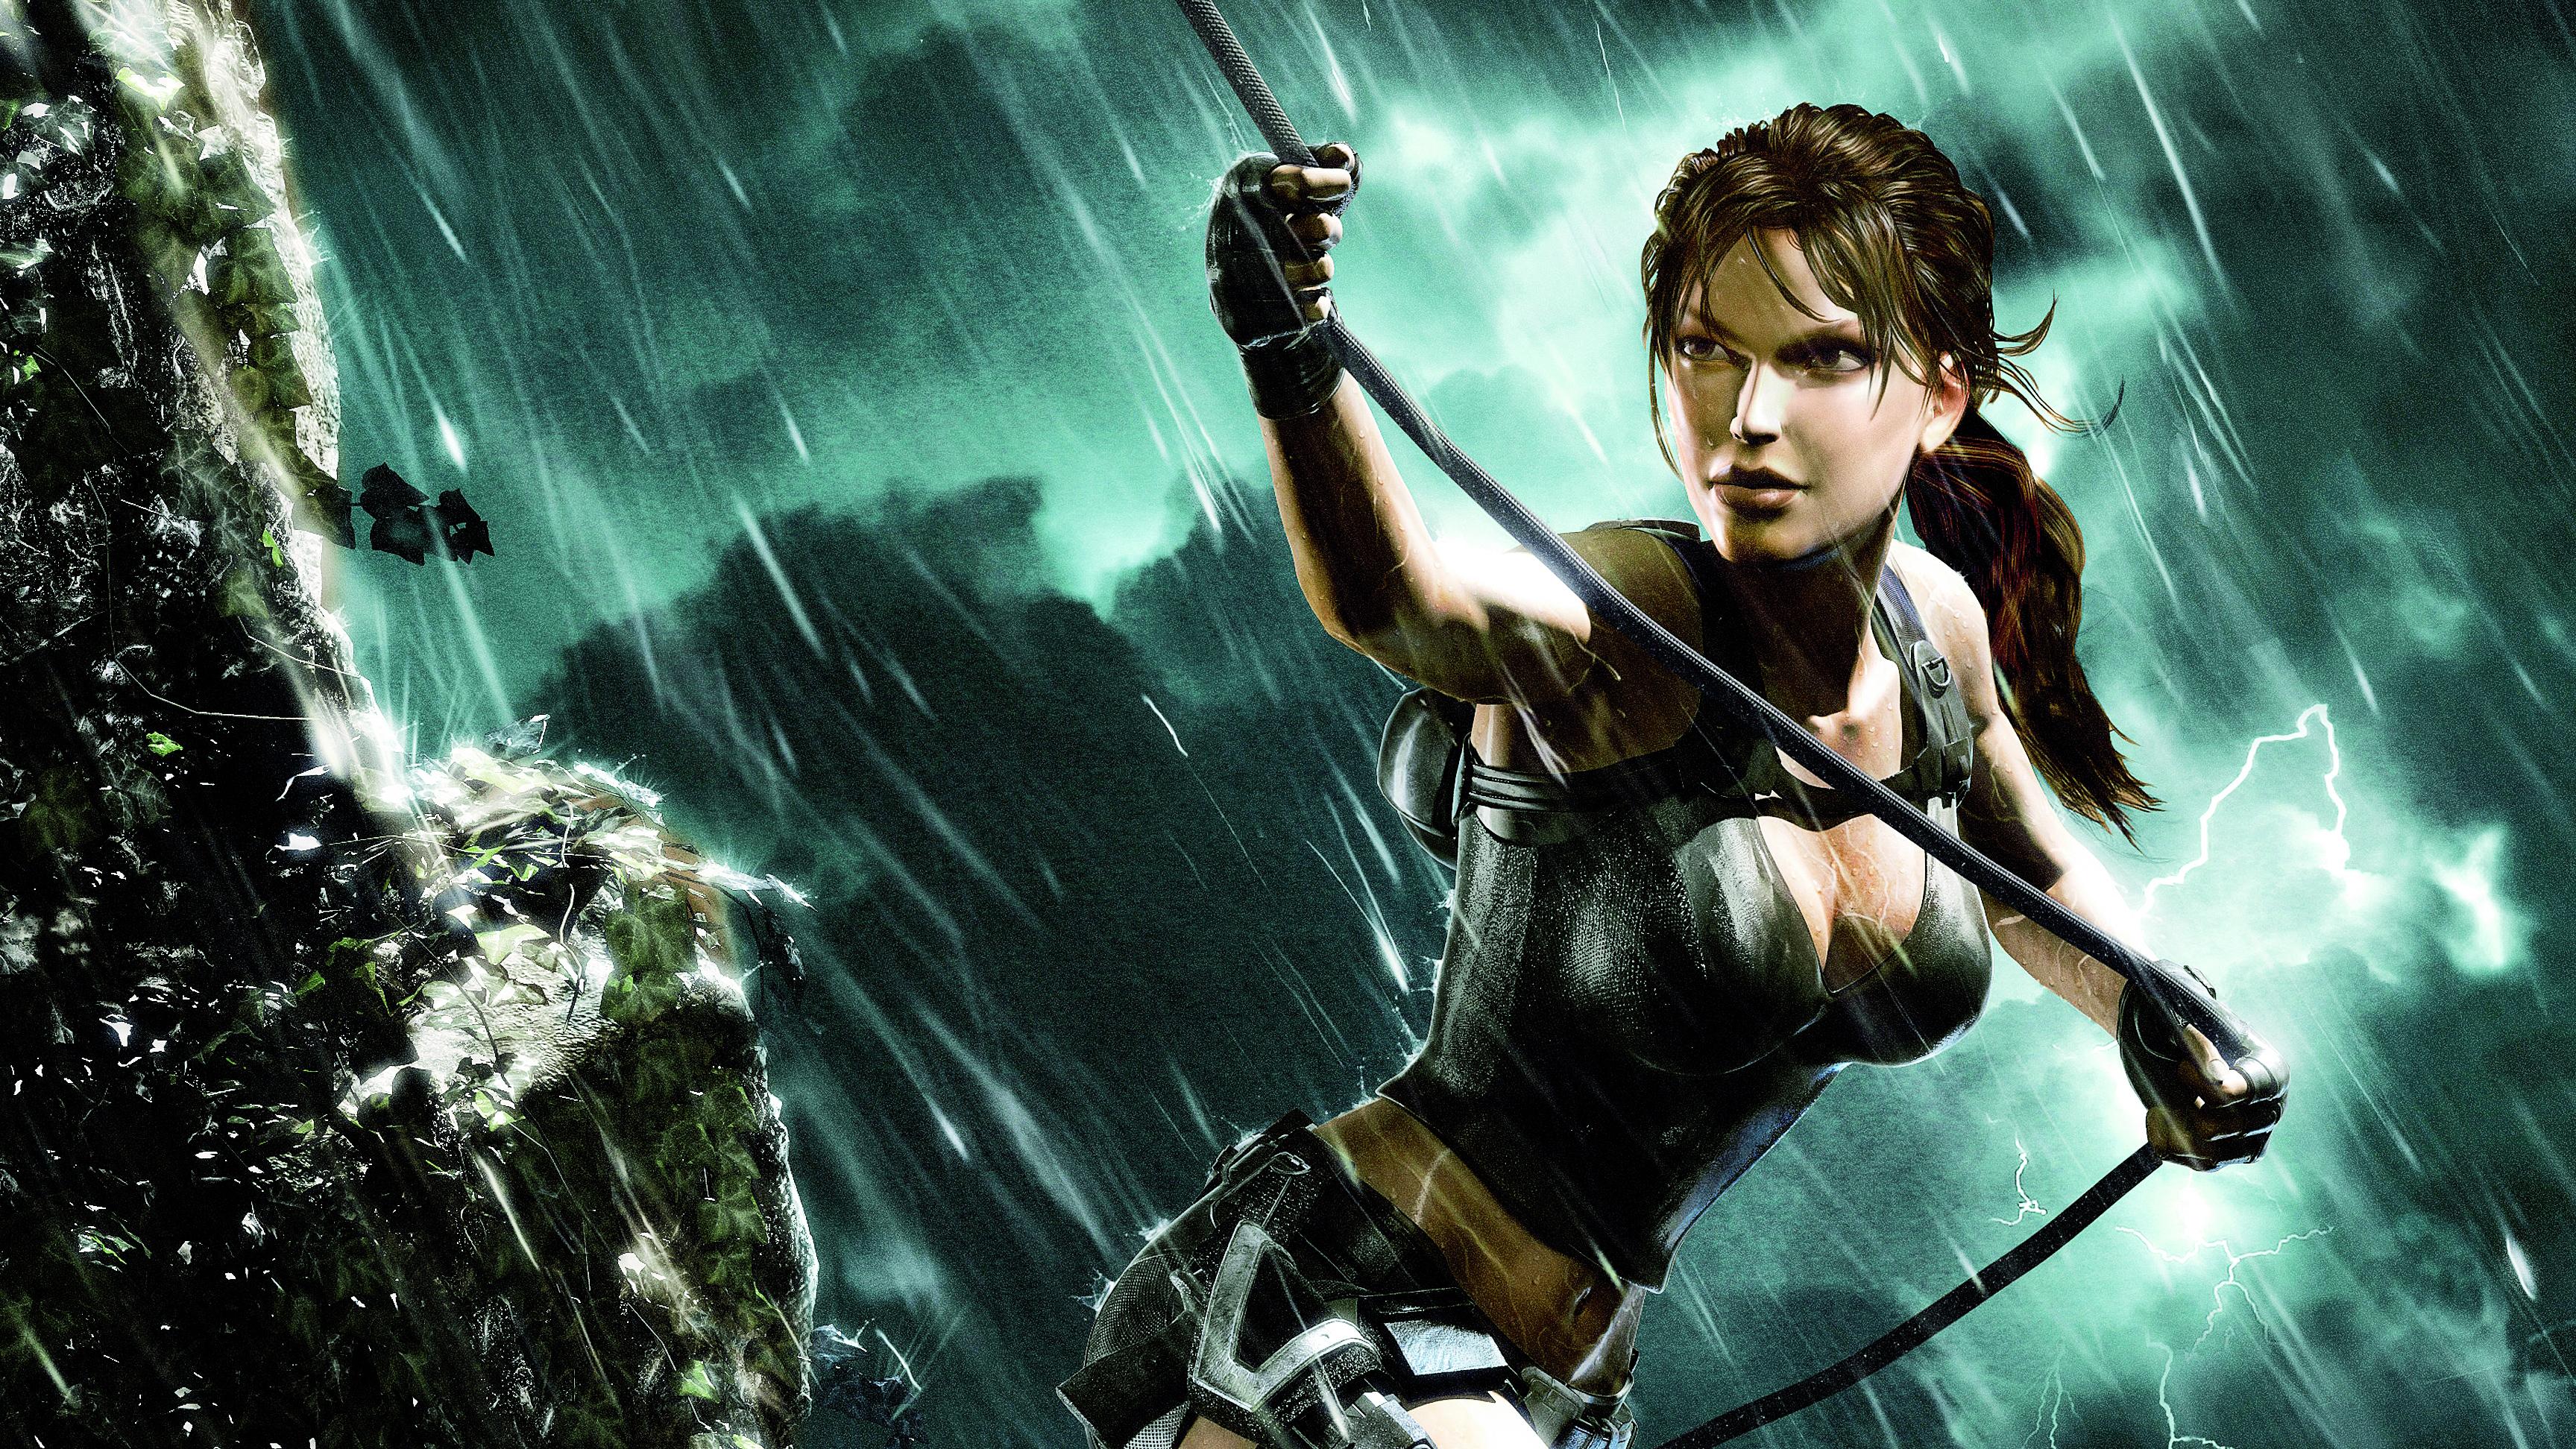 Tomb Raider Underworld 4k, HD Games, 4k Wallpapers, Images ...